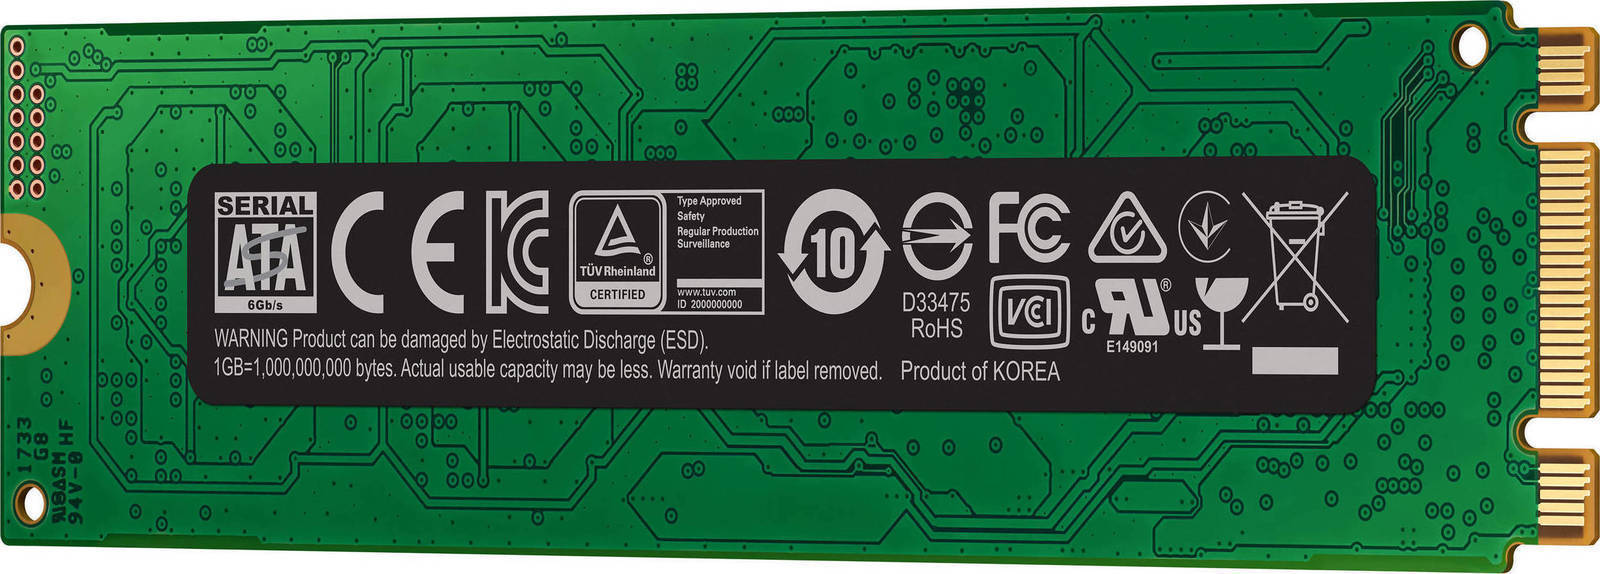 Samsung 860 Evo M.2 500GB Σκληρός Δίσκος SSD